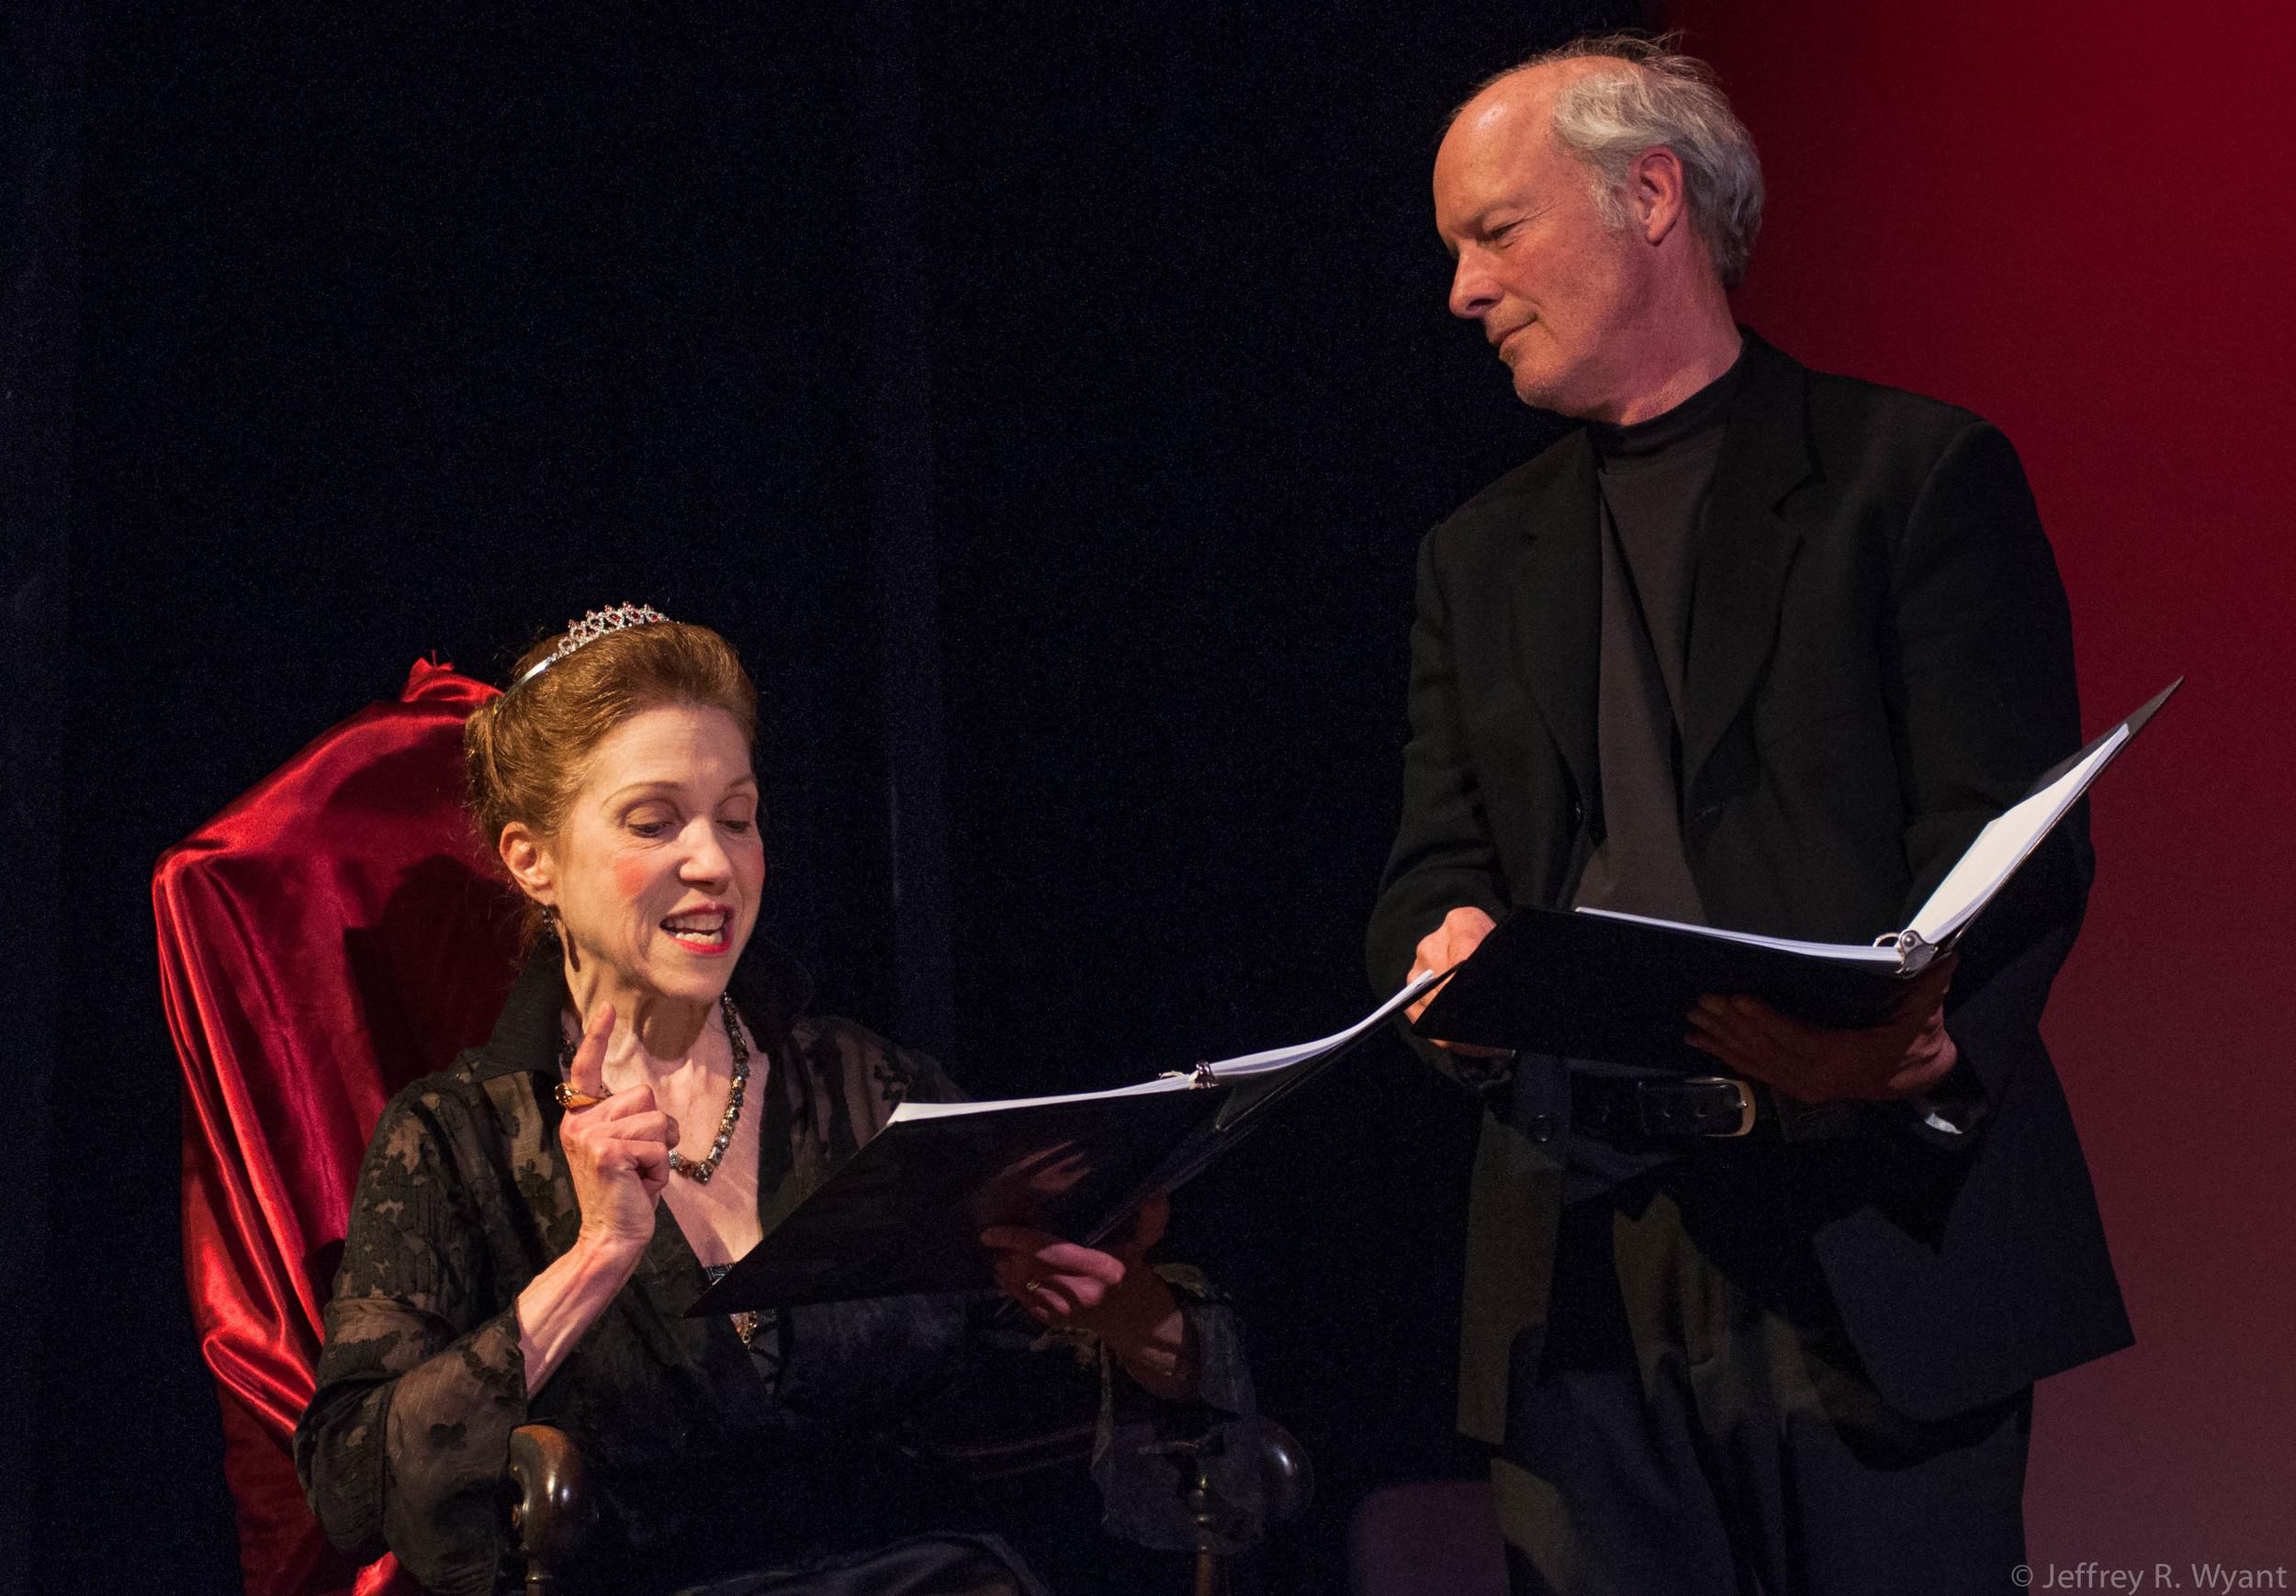 Emilie Roberts as Queen Elizabeth; John O'Hern as Sir Robert Cecil. All photos by Jeffrey R. Wyant.